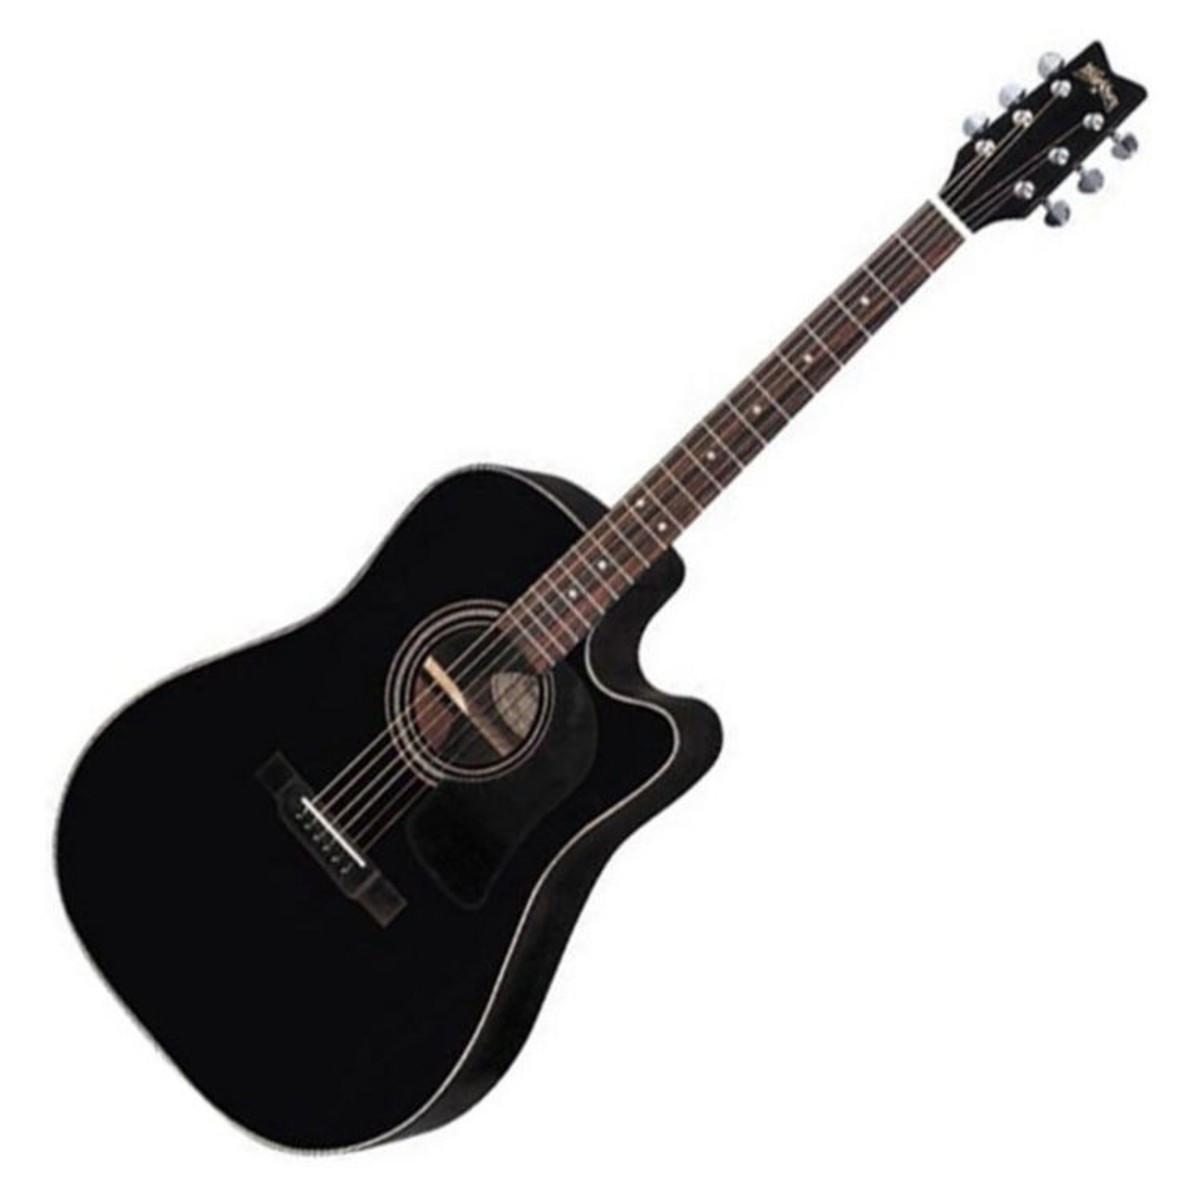 washburn wd10sce guitare electro-acoustique